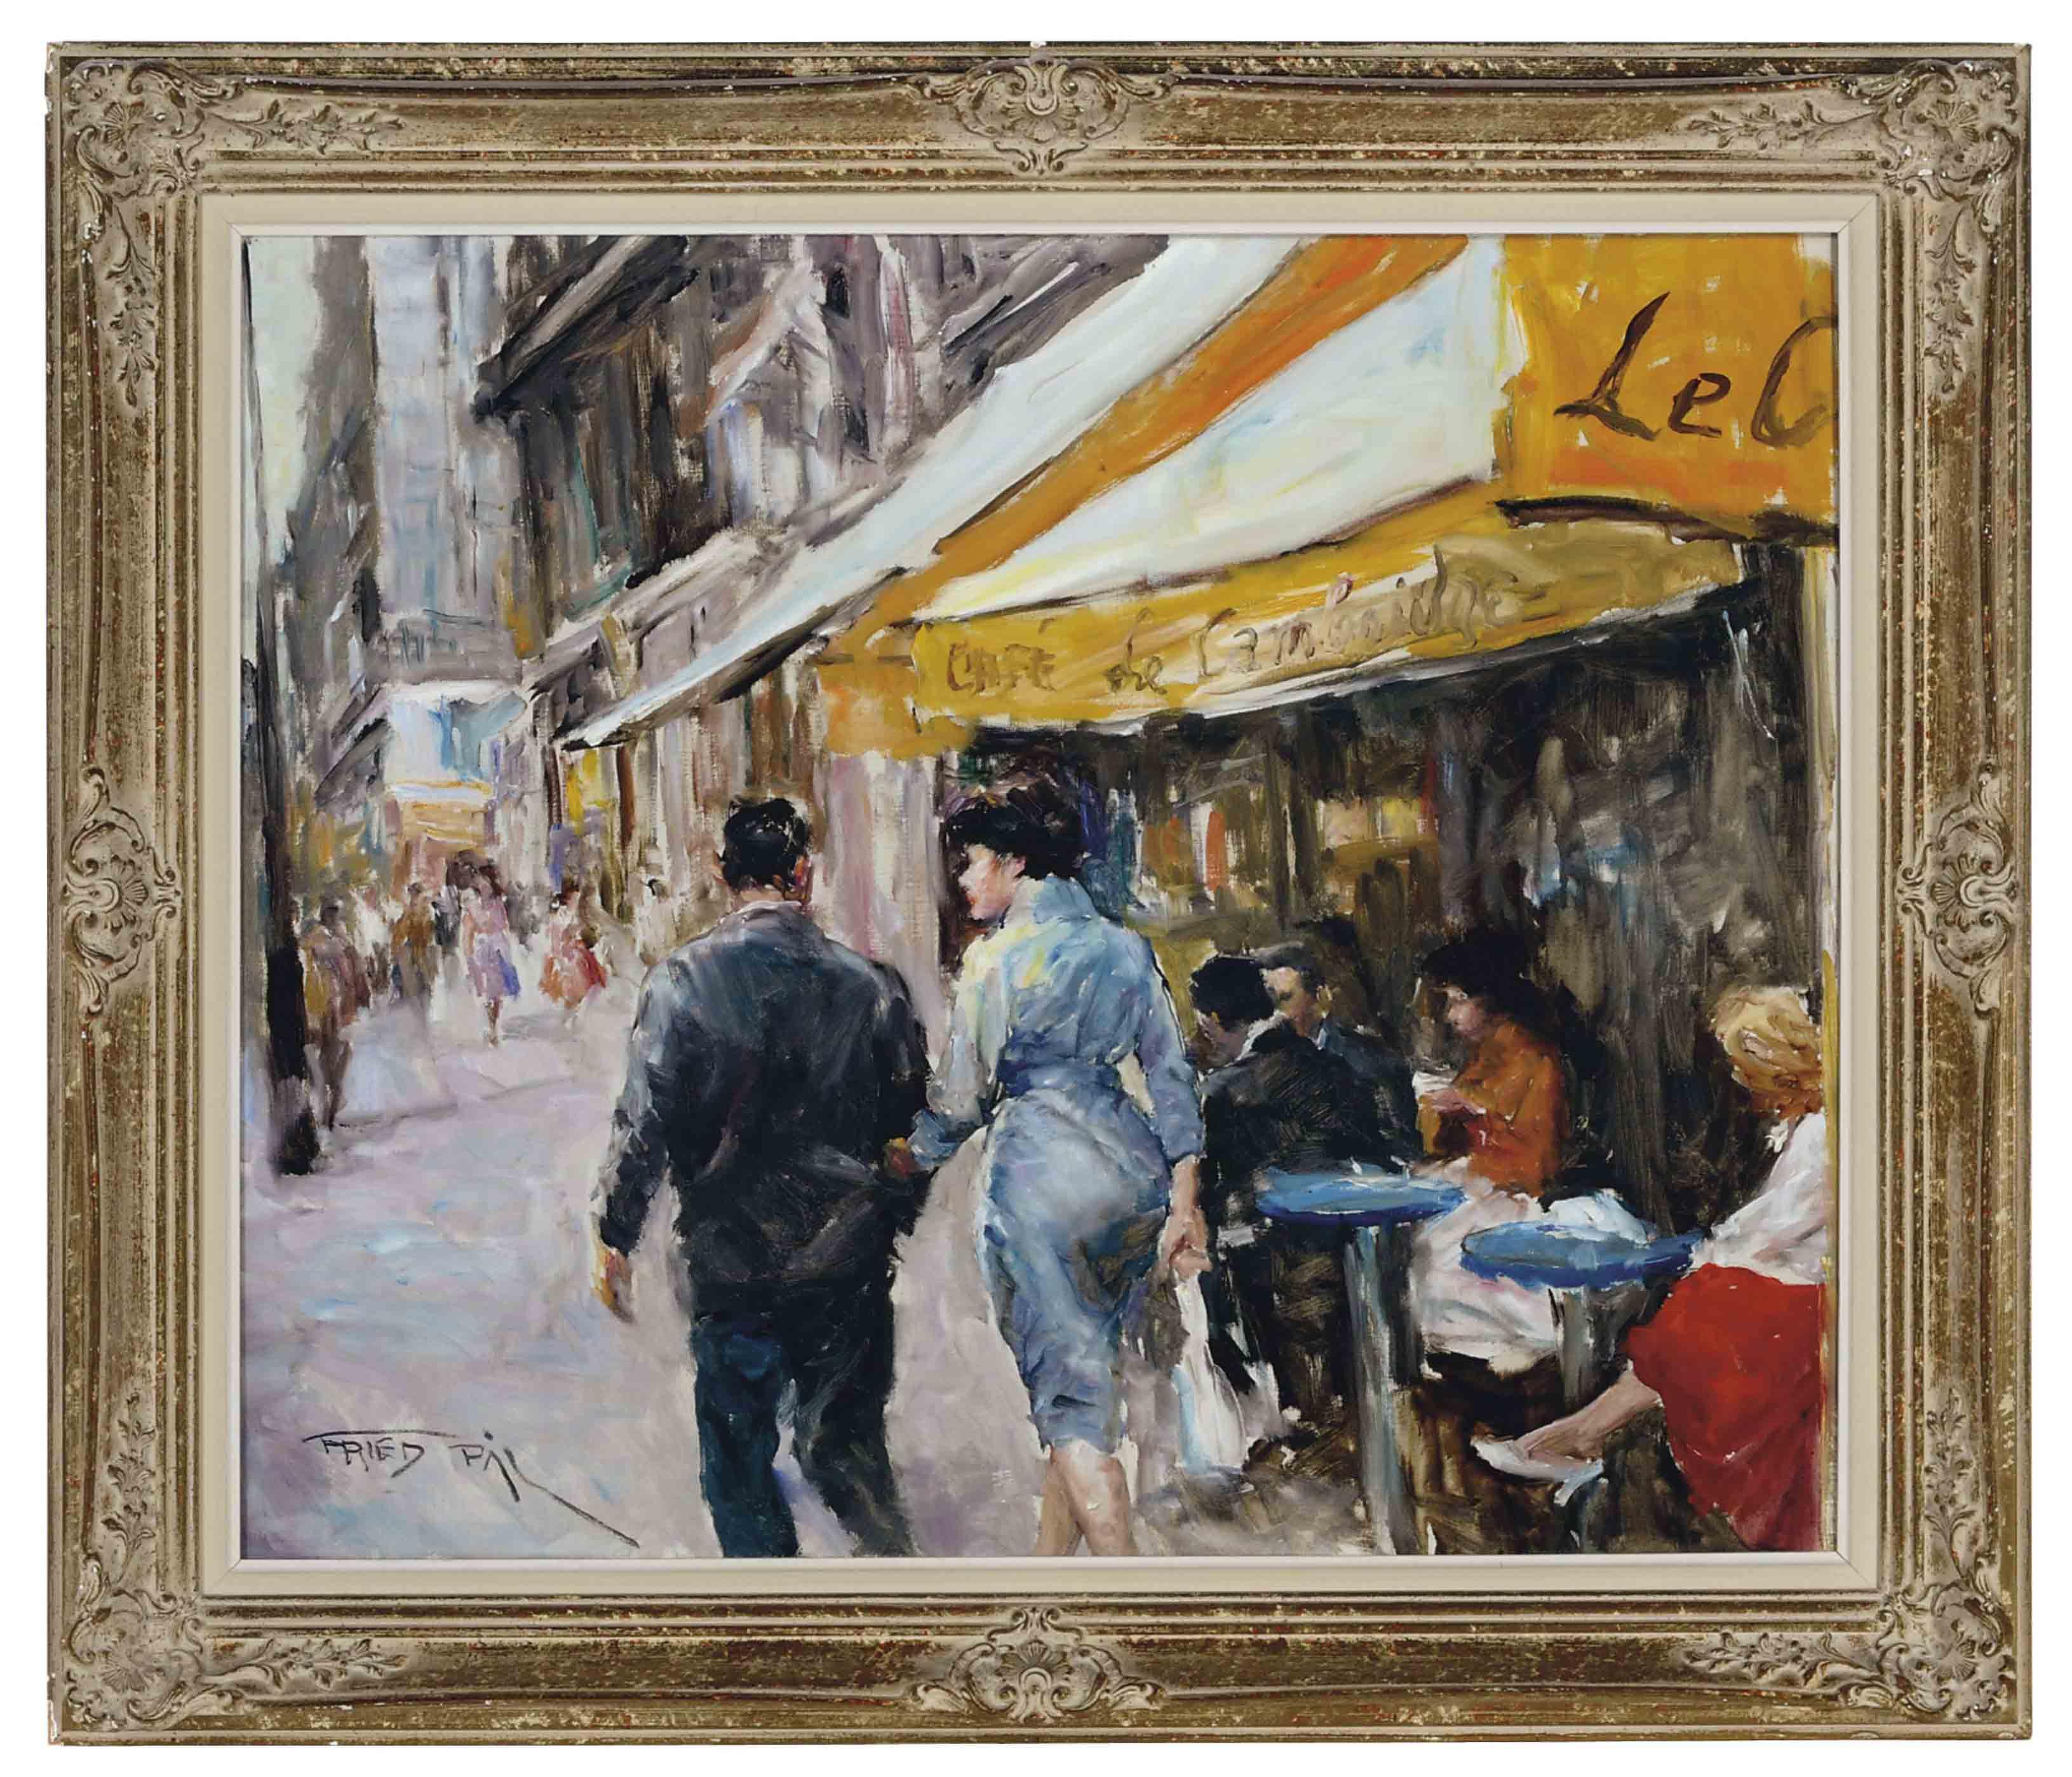 Strolling down a Parisian Street